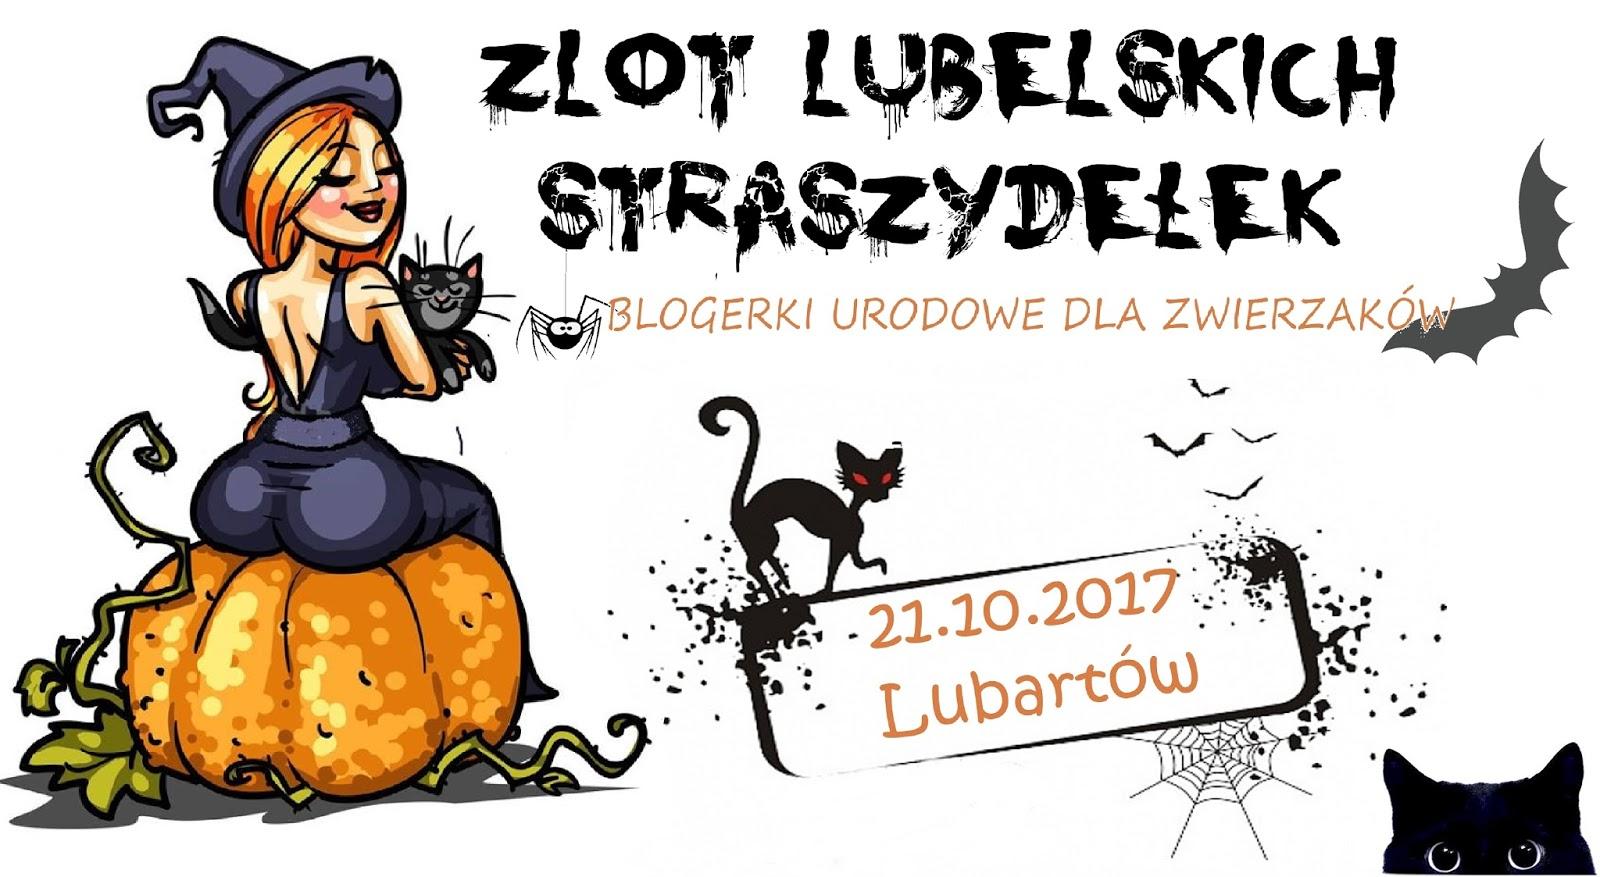 Zlot Lubelskich Straszydełek - zapraszamy na spotkanie blogerek :)